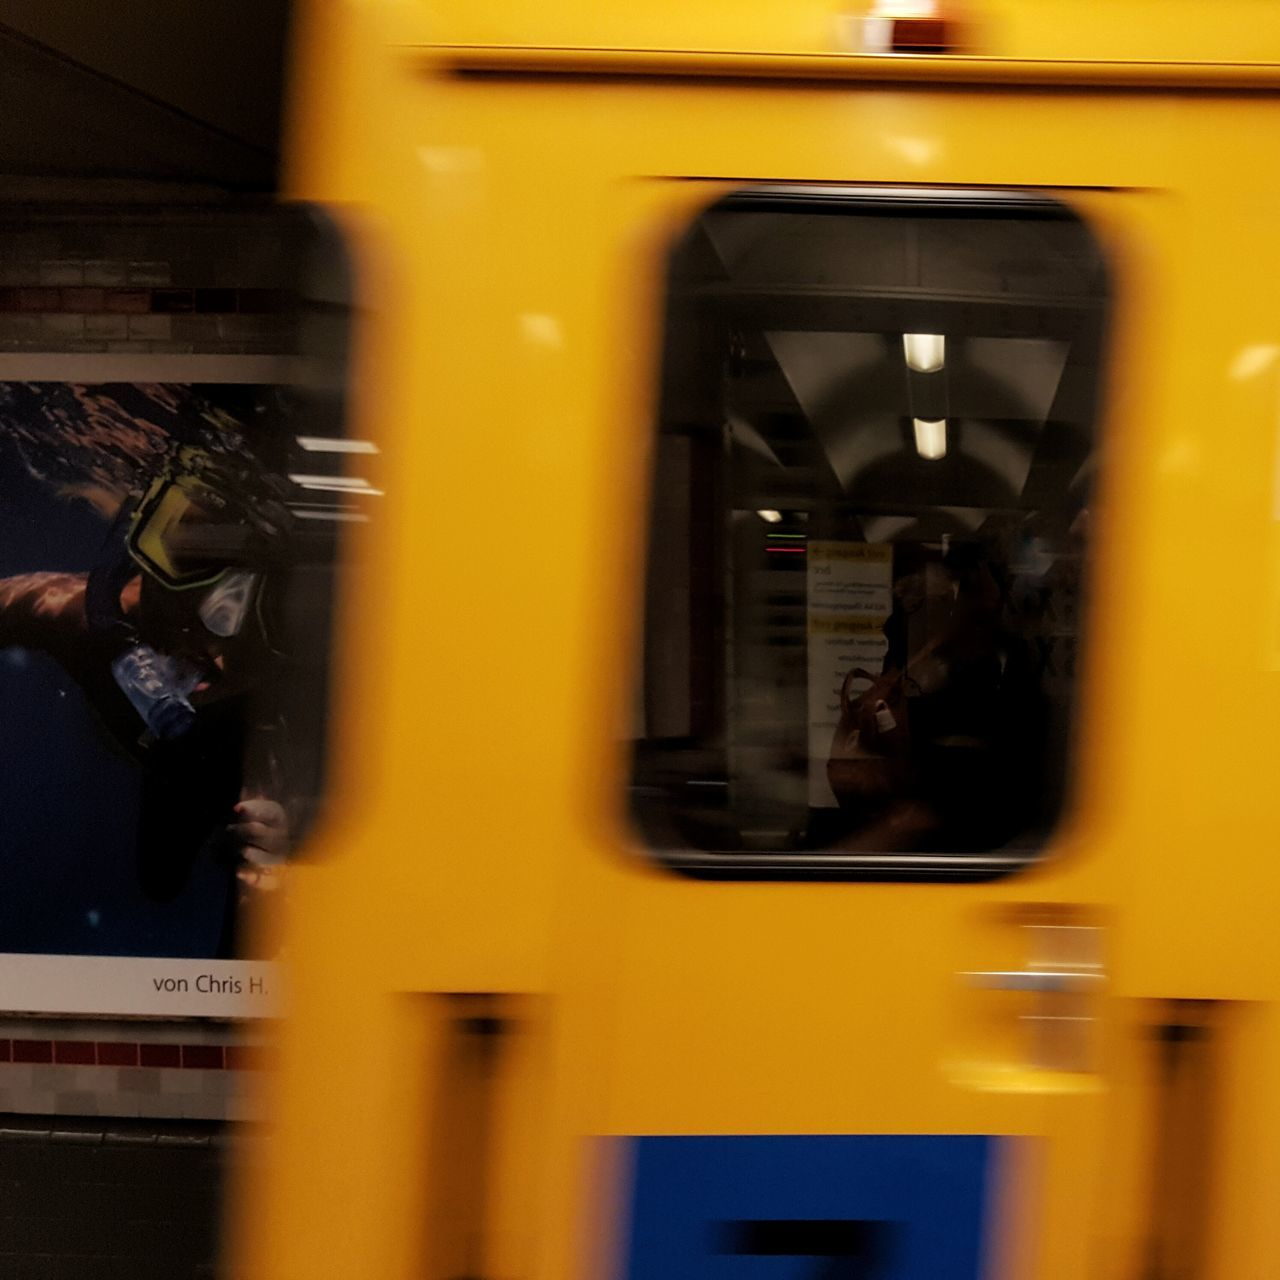 yellow, transportation, public transportation, mode of transport, train - vehicle, metro train, passenger train, bus, subway station, subway train, land vehicle, indoors, vehicle seat, no people, day